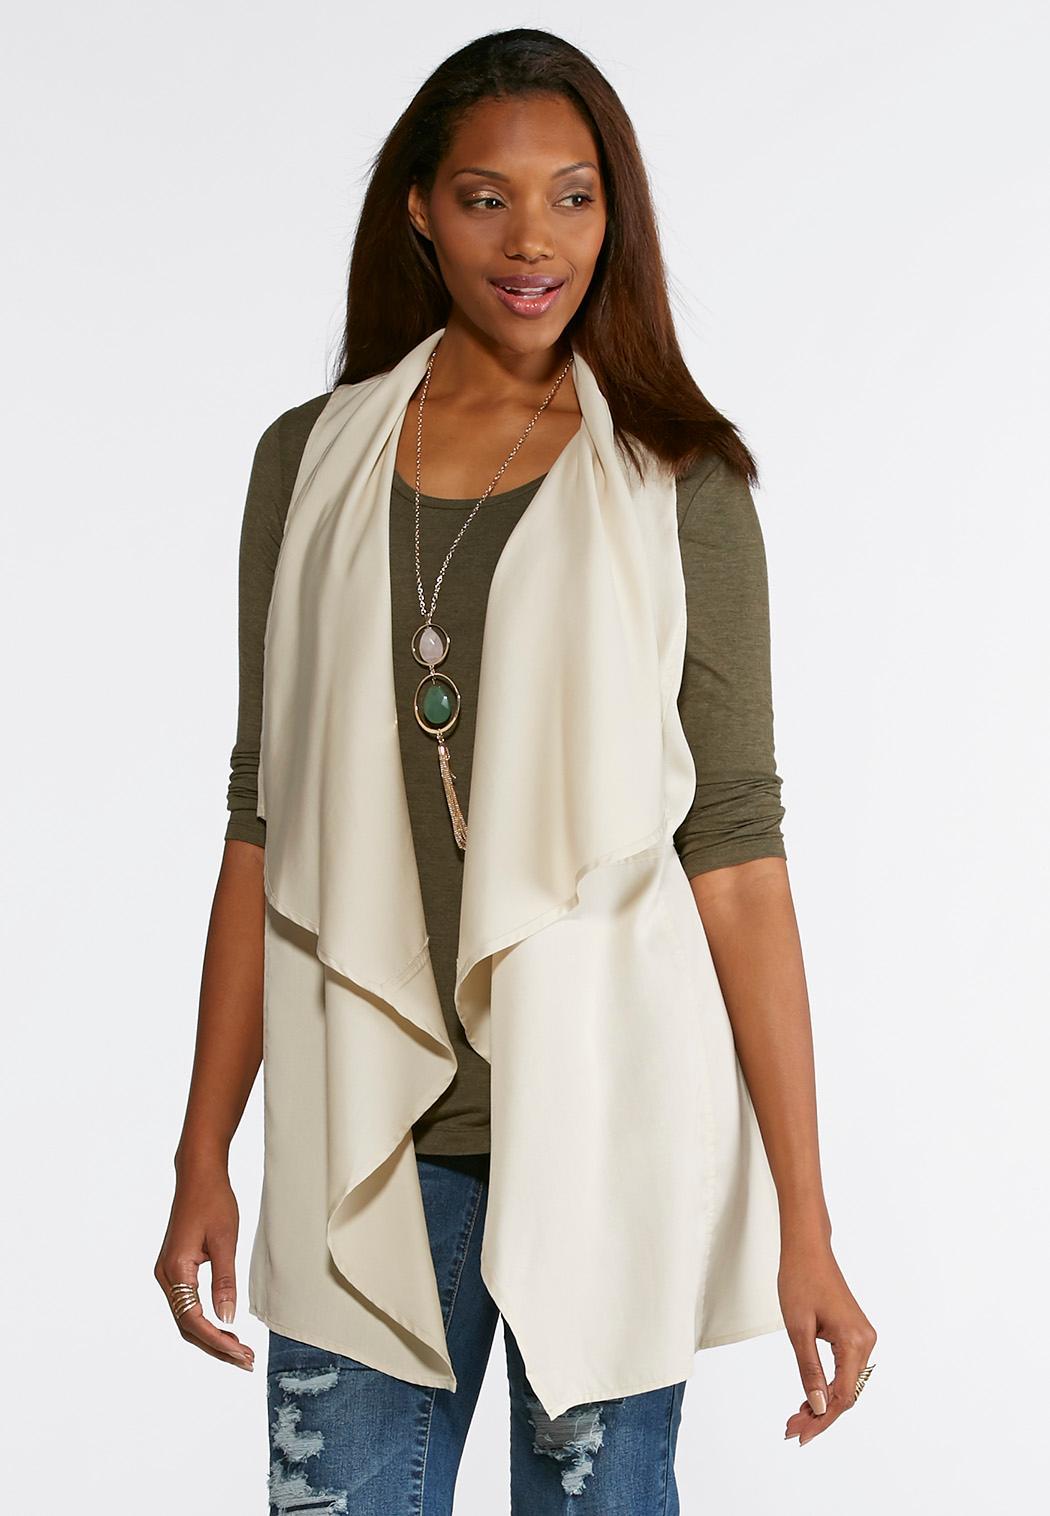 product sweater drape drapes michael fringe front kors womens cream cardigan